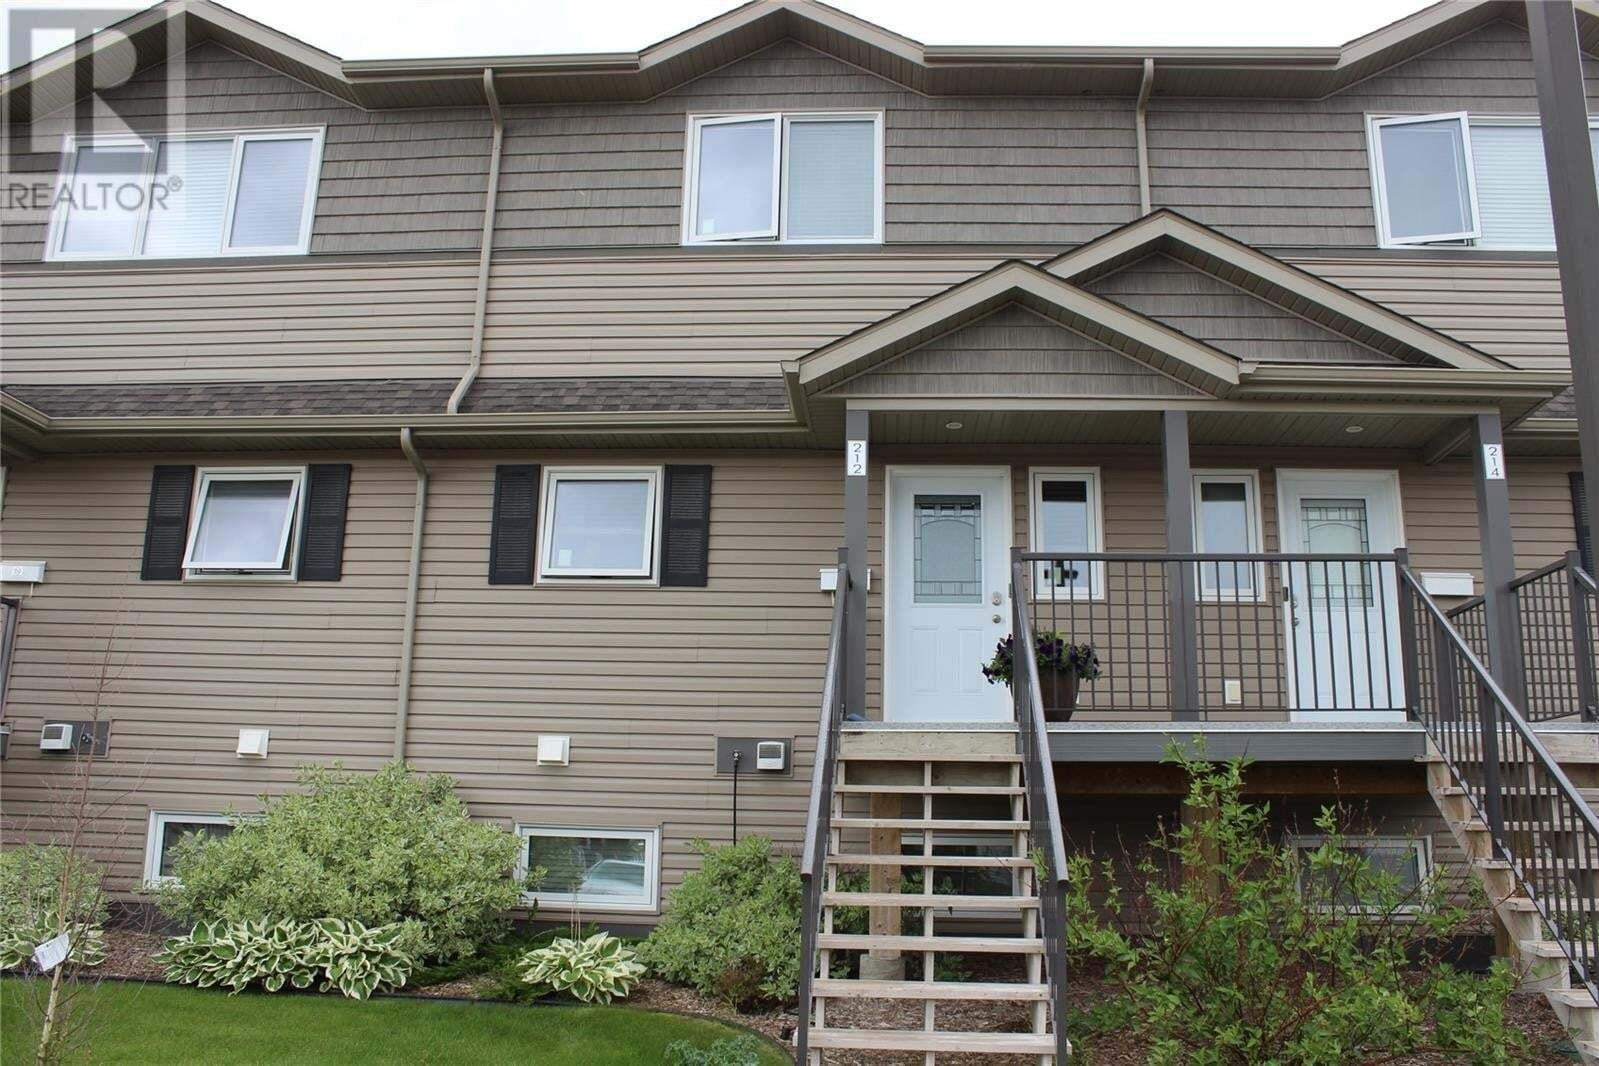 Townhouse for sale at 115 Dalgleish Li Unit 212 Saskatoon Saskatchewan - MLS: SK817278